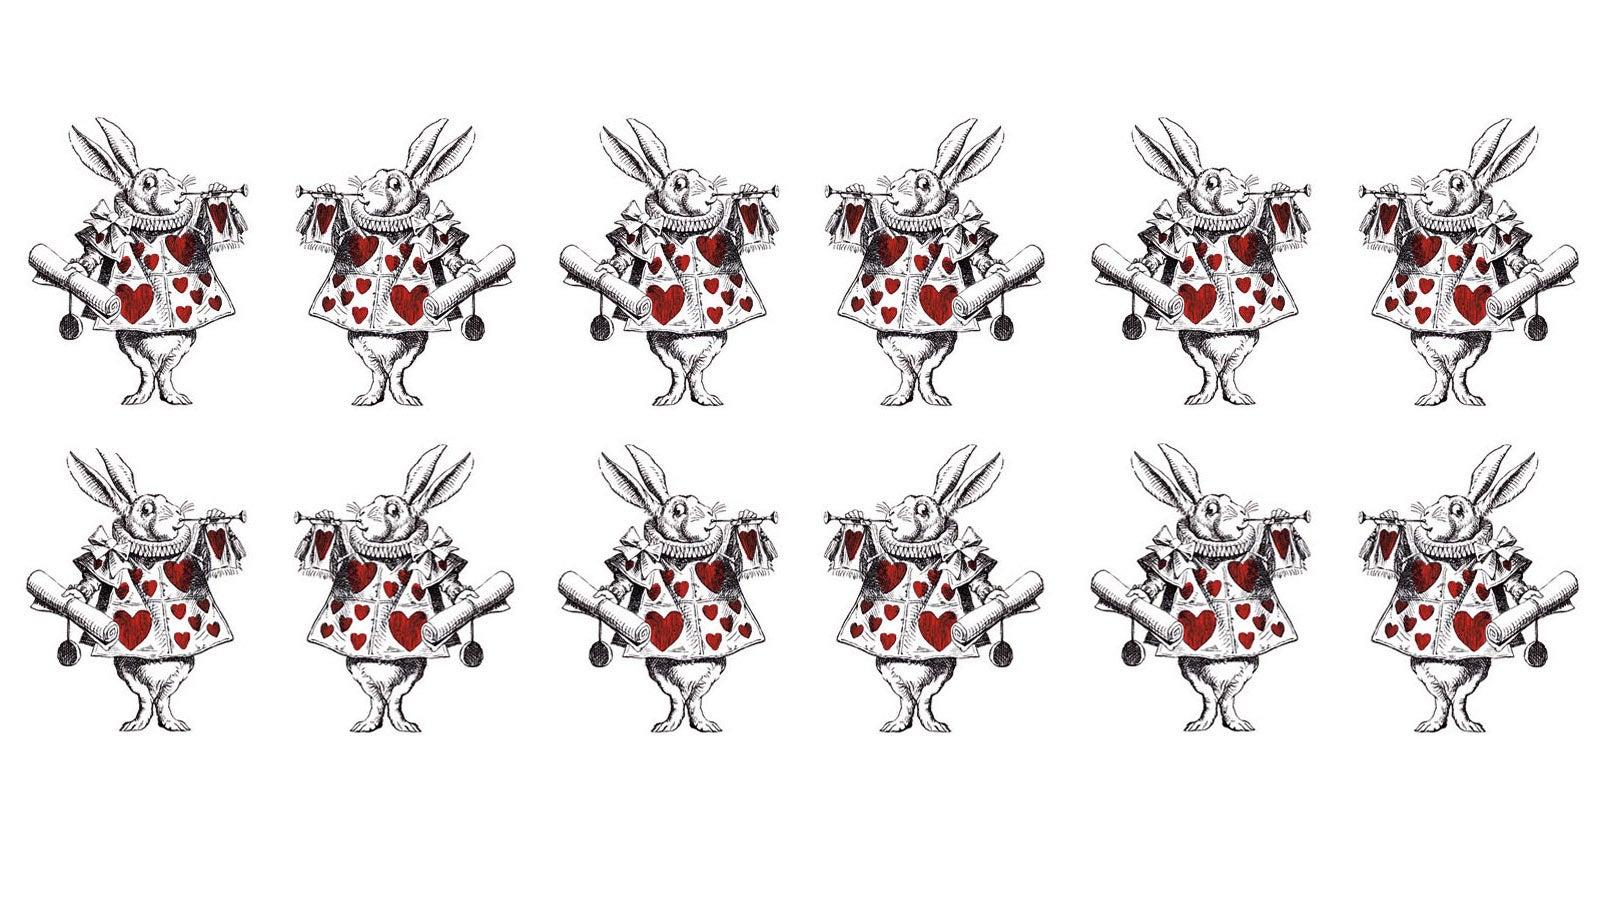 Illustration of the White Rabbit from Alice in Wonderland